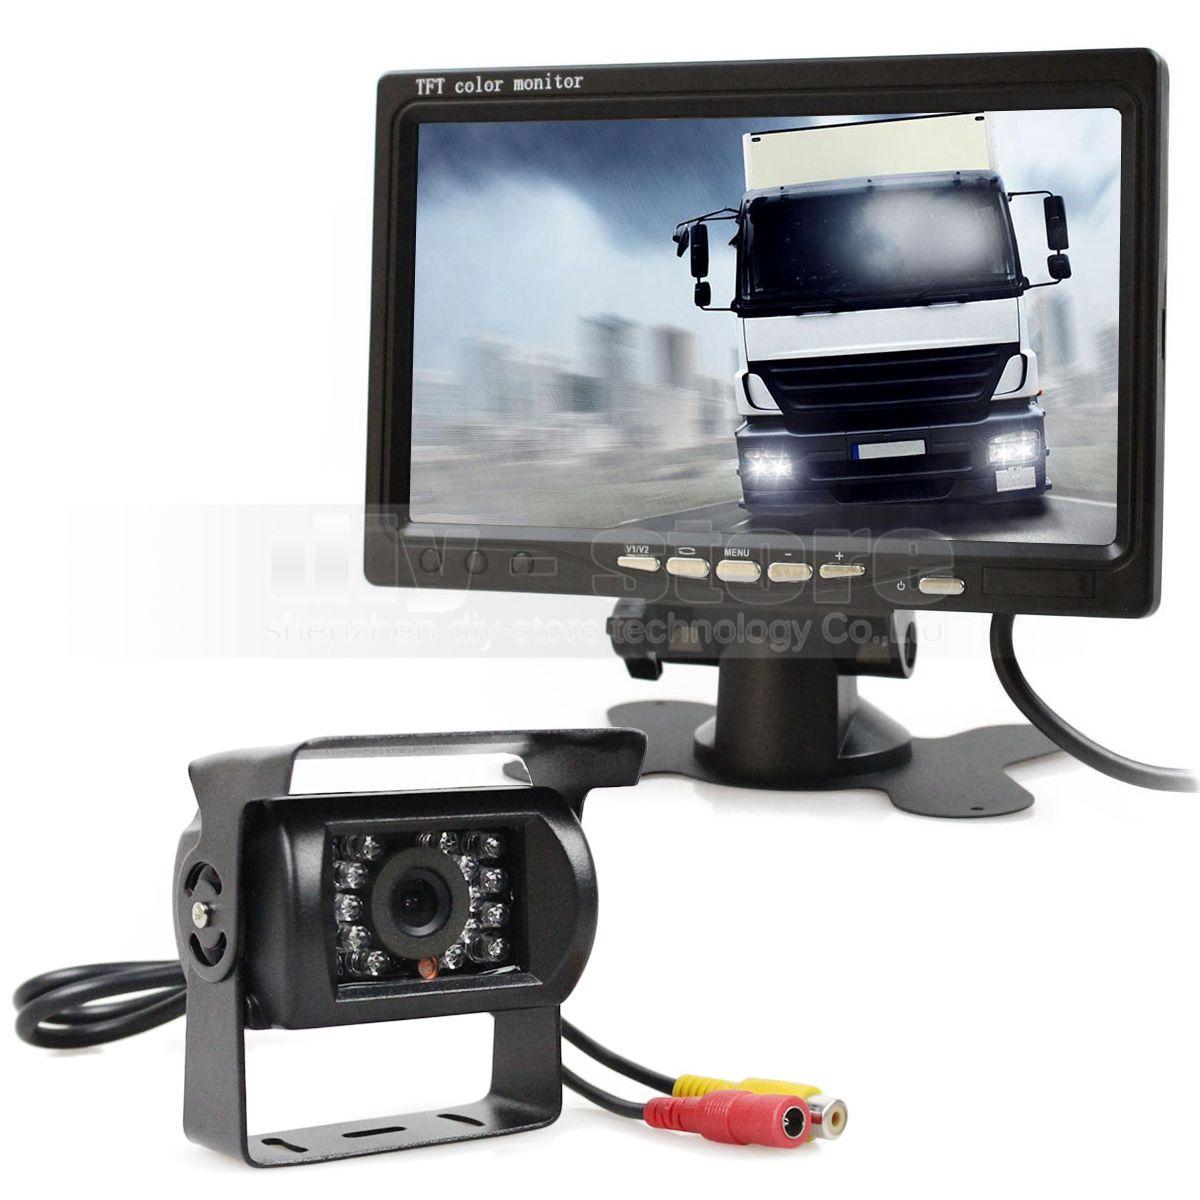 DC12V - 24V 반전 시스템 7 인치 TFT LCD 자동차 모니터 + IR 야간 투시경 후면보기 CCD 카메라 + 원격 제어